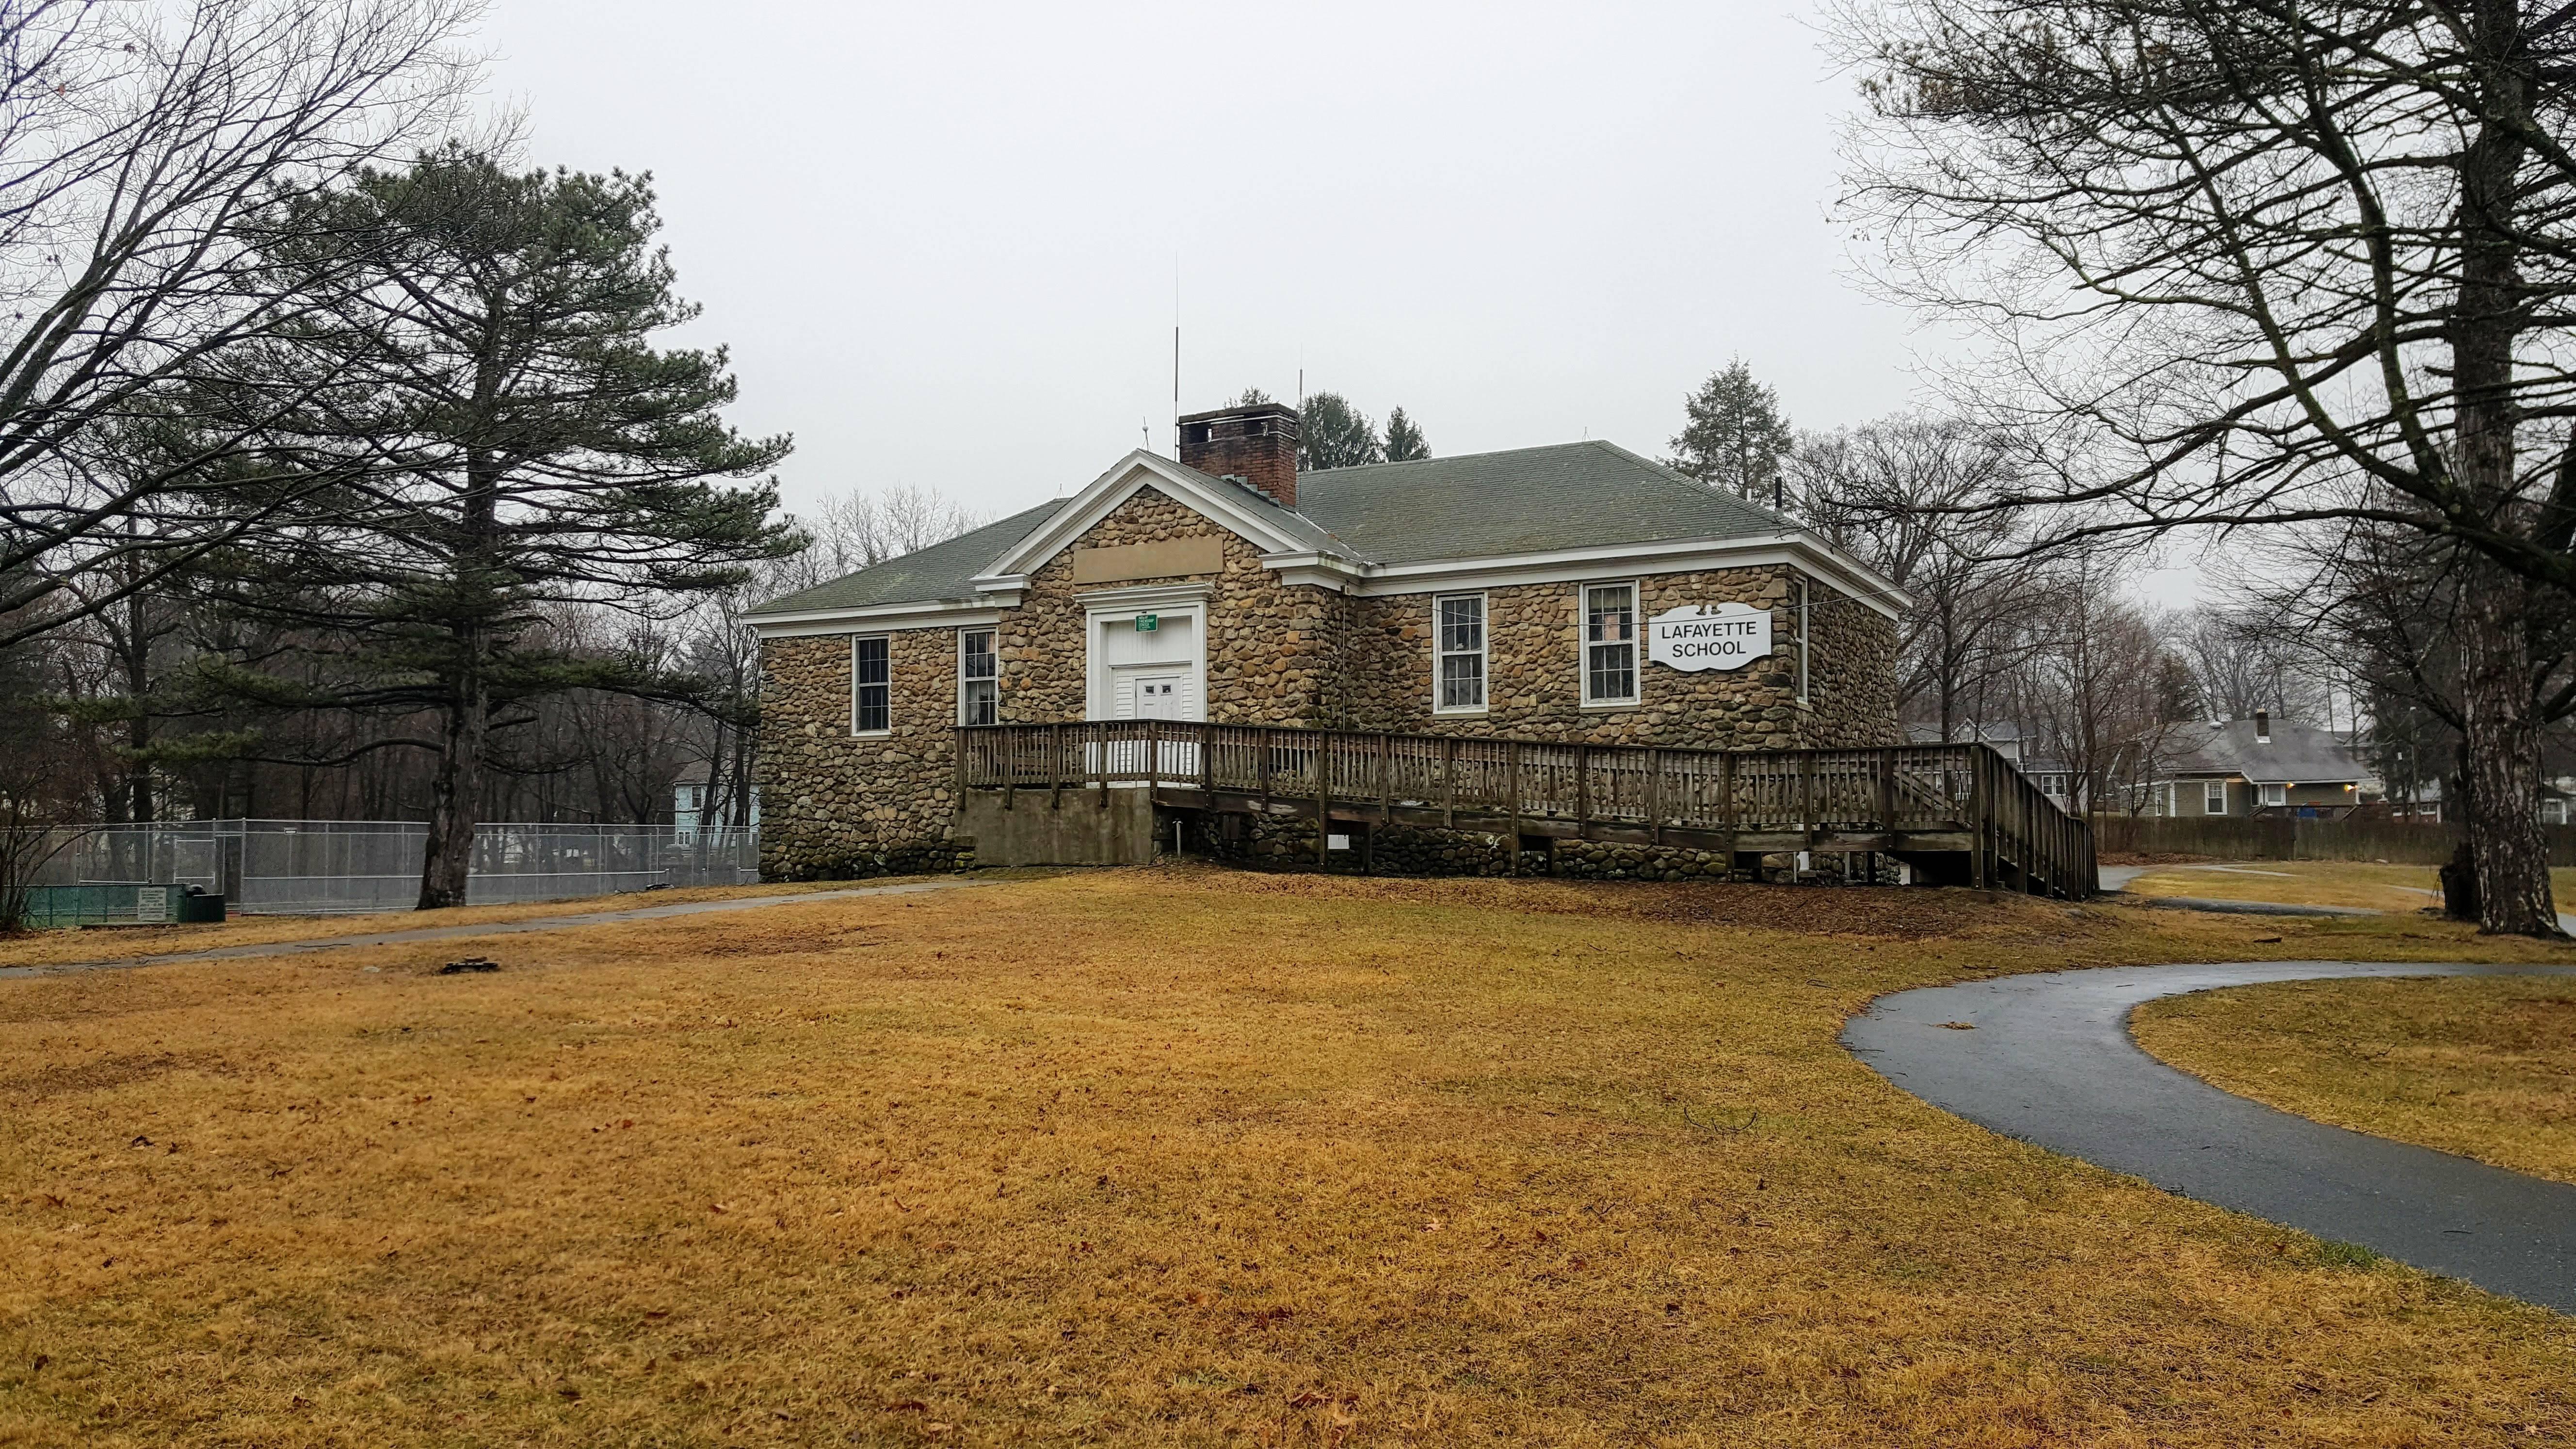 Former Lafayette Schoolhouse in Roxbury